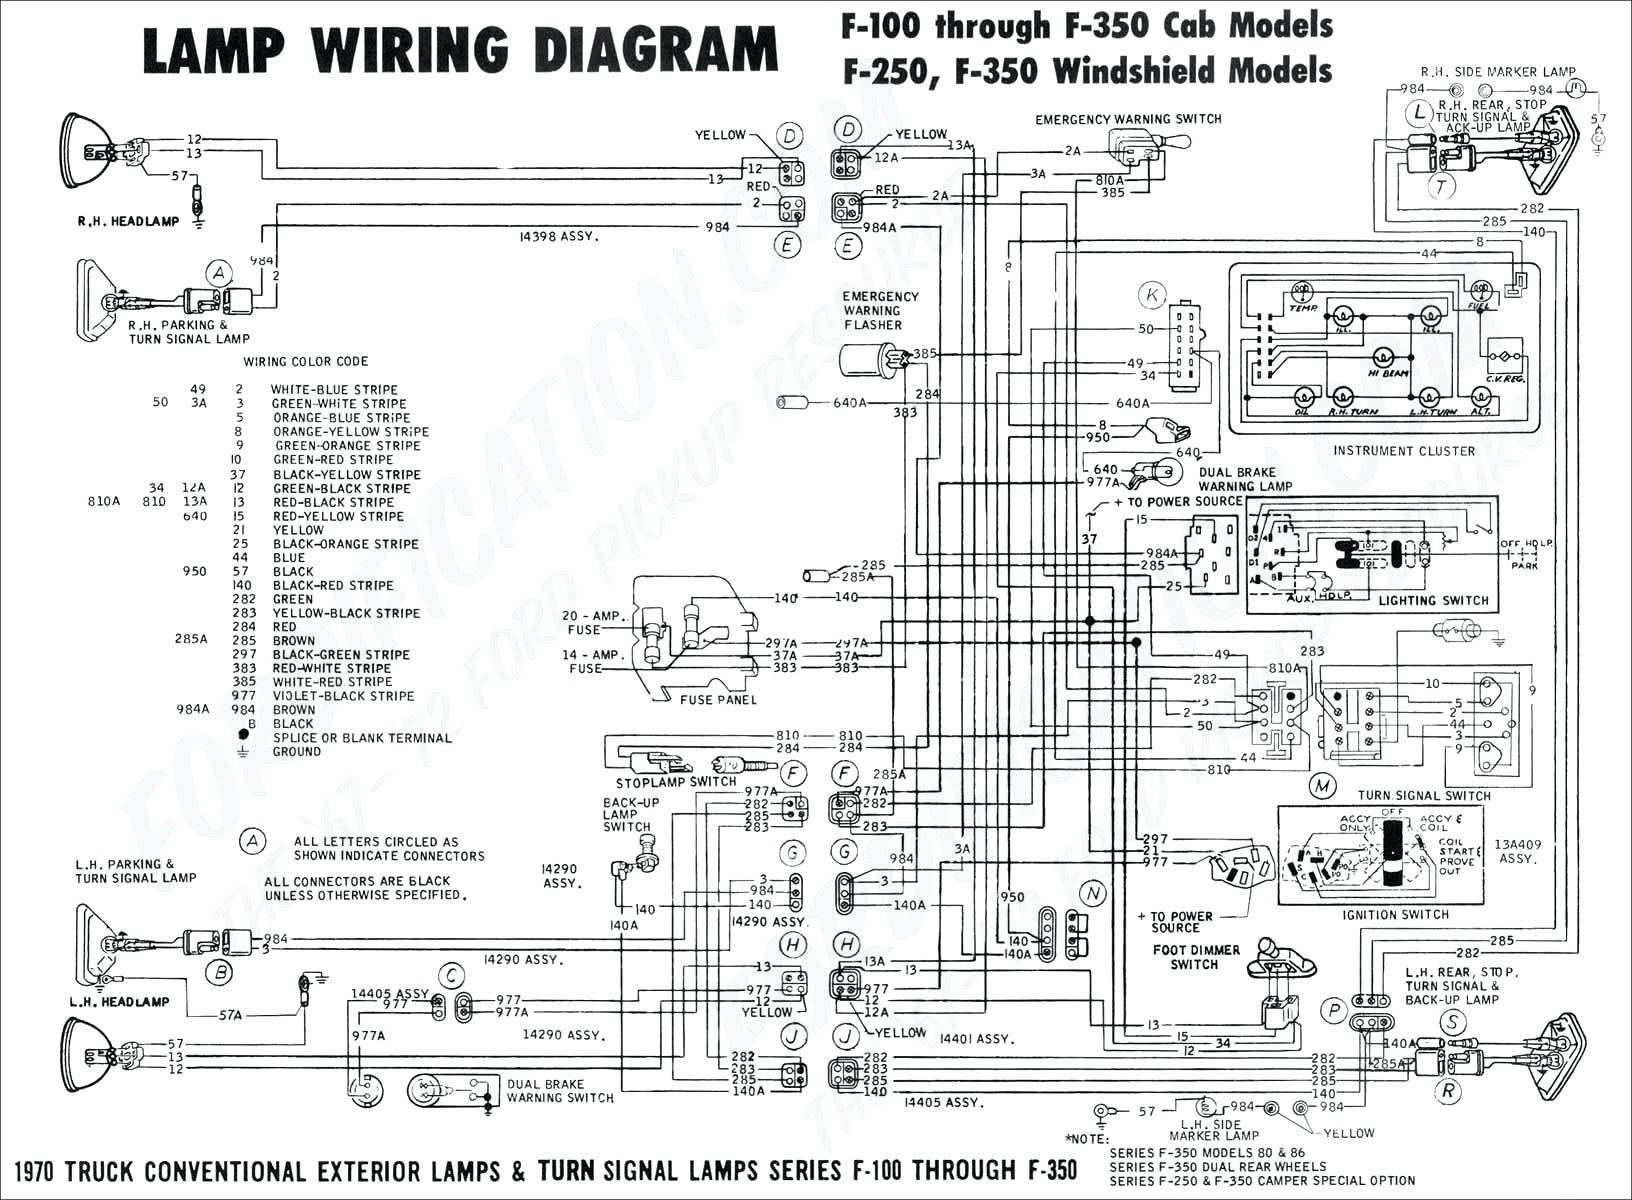 2000 Chevy Silverado Brake Light Wiring Diagram 2005 Chevy Silverado Wiring Diagram Unique 2005 Chevy Silverado Of 2000 Chevy Silverado Brake Light Wiring Diagram